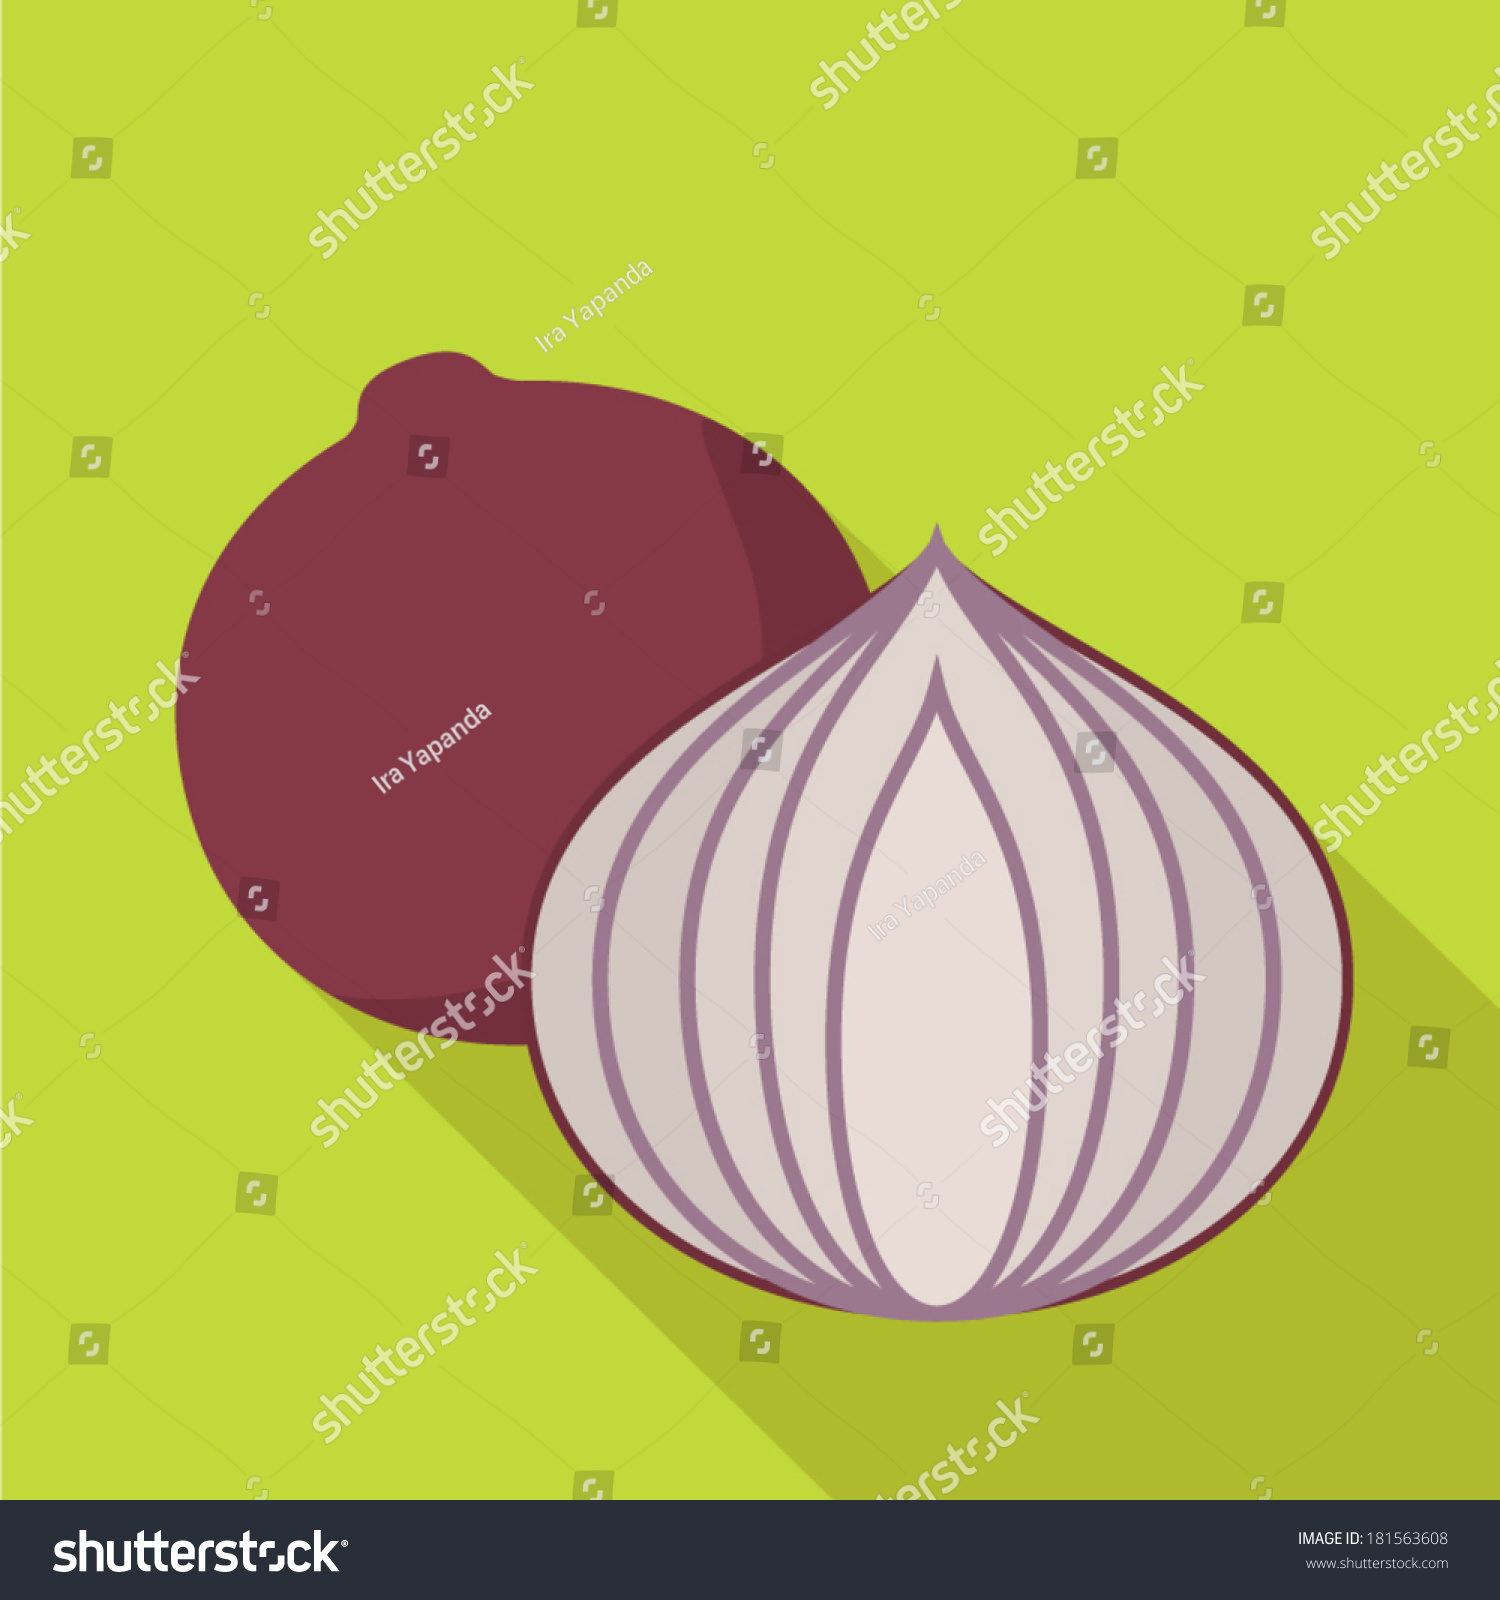 Interior designs medium size vertically growing onions growing onions - Onion Flat Design Vector